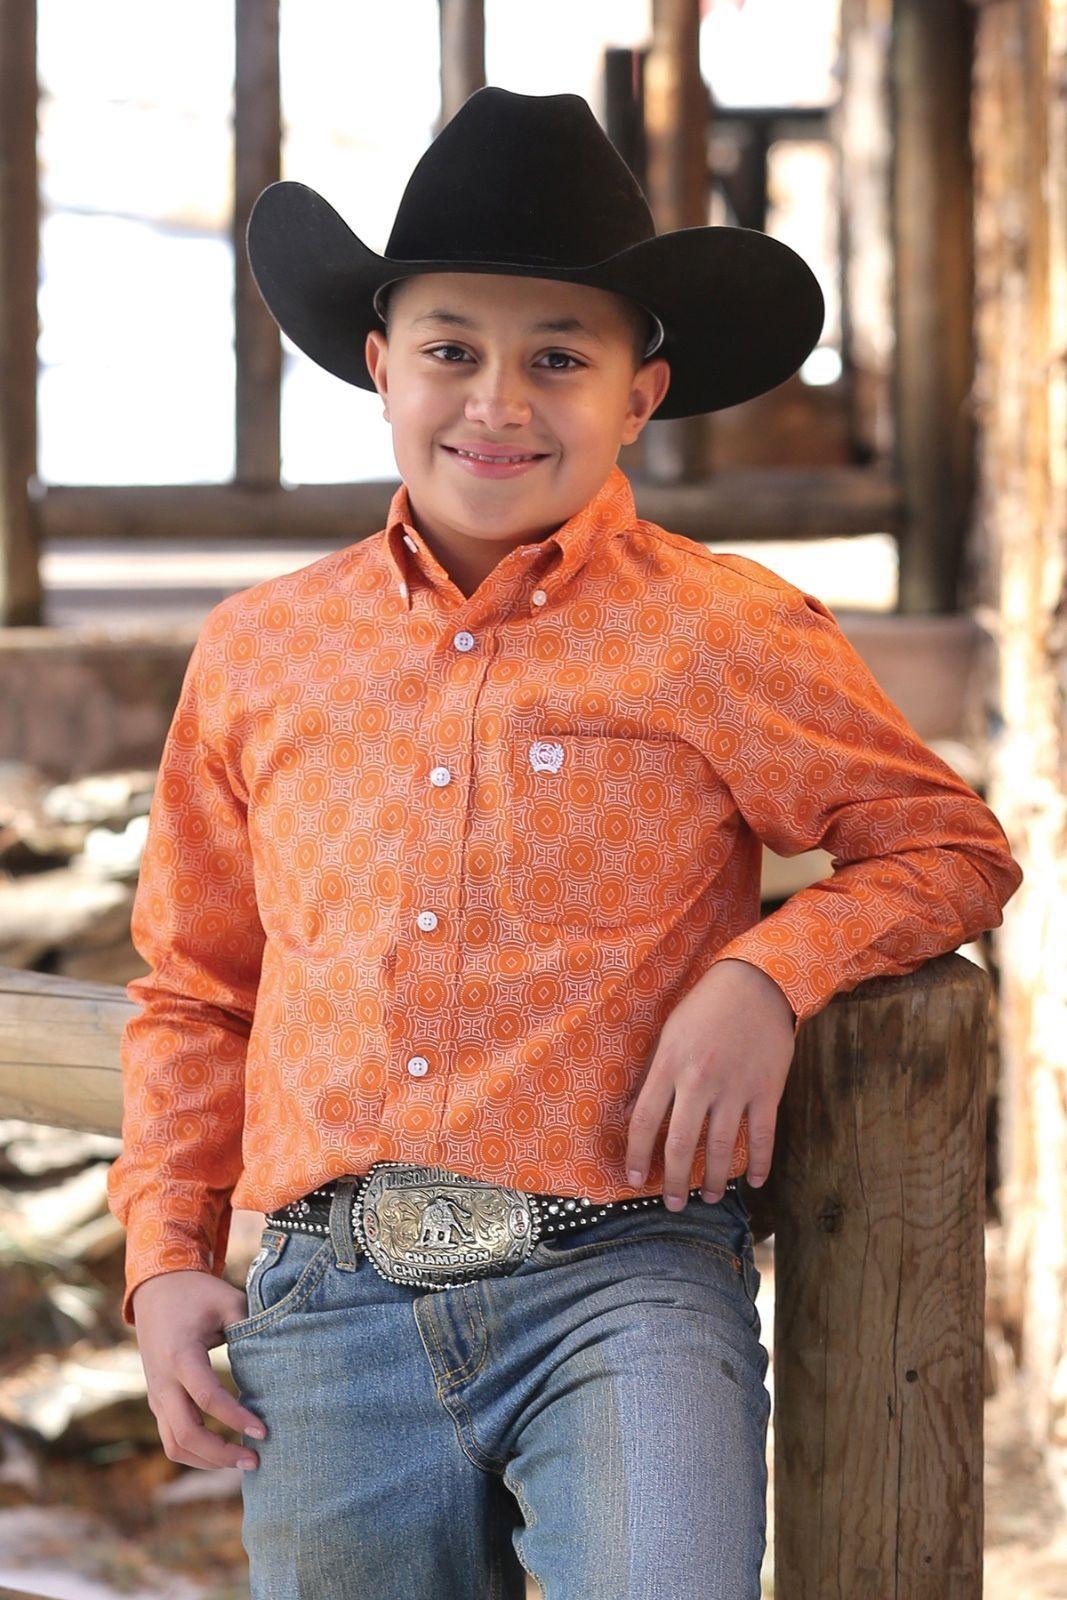 193fac36e Tops Shirts and T-Shirts 175521: Cinch Boy'S Orange Sunburst Printed Long  Sleeve Western Shirt Mtw7060144 -> BUY IT NOW ONLY: $36.95 on eBay!